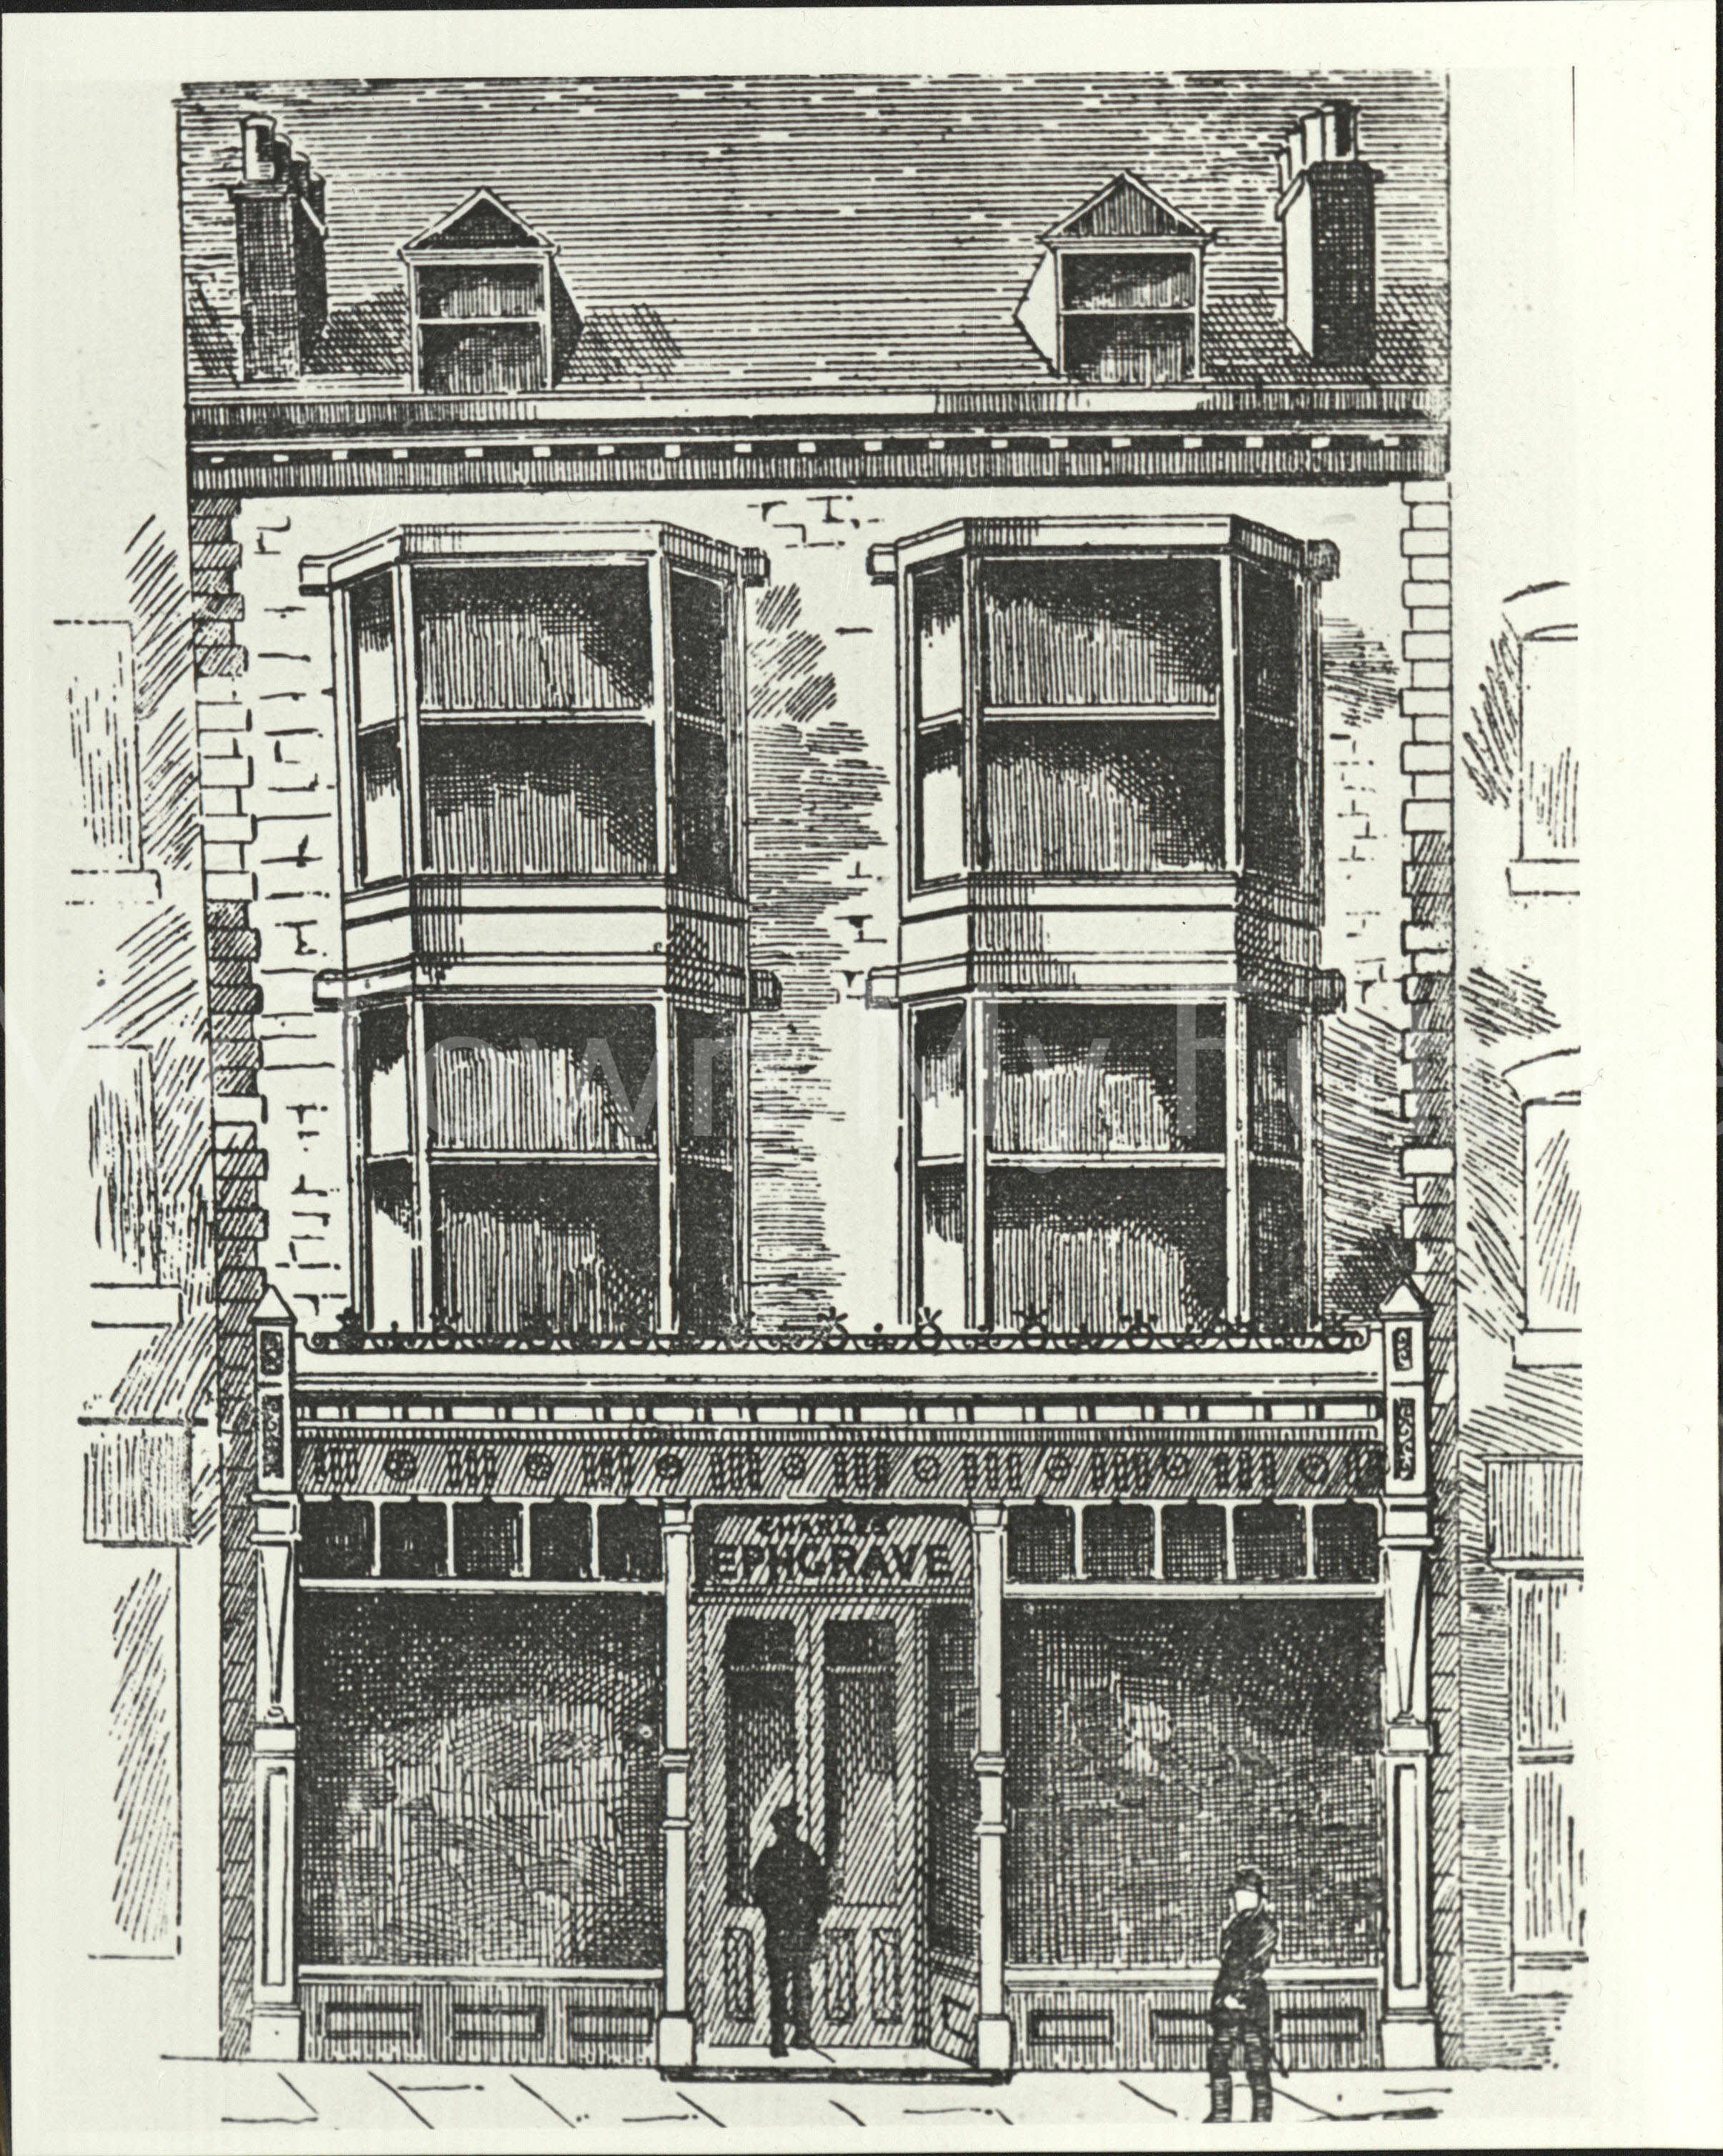 Charles Ephgrave Linthorpe Road, 1889